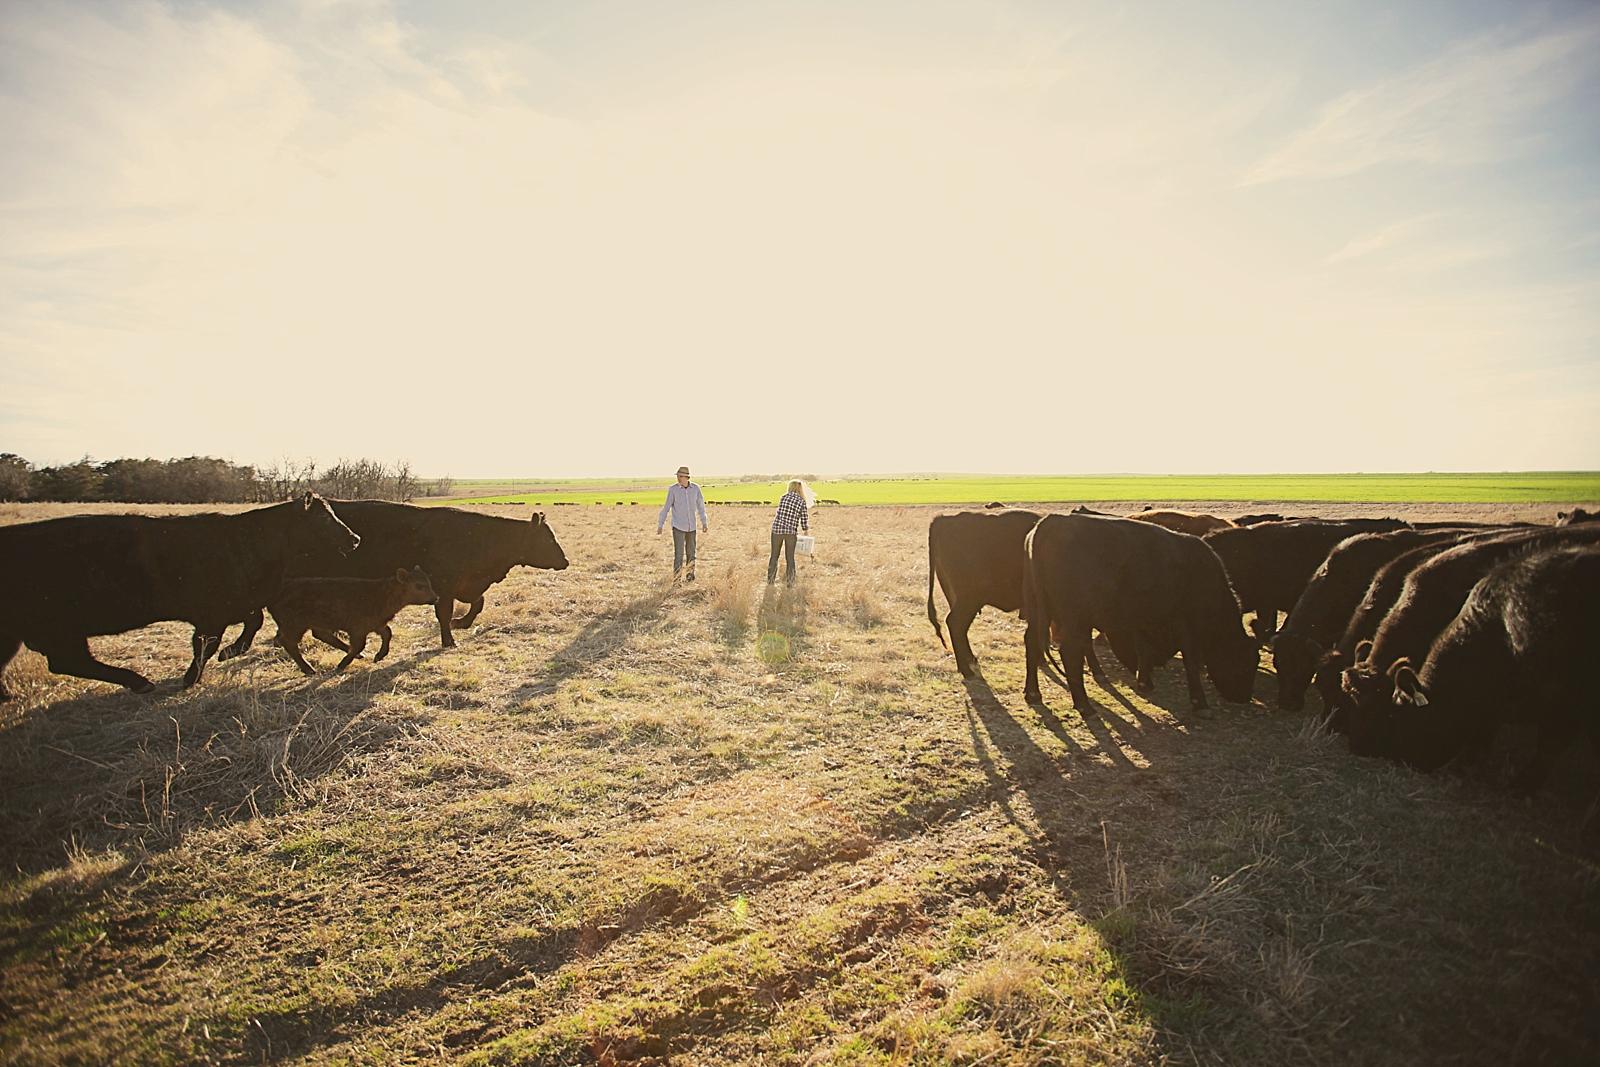 couple feeding cows, western oklahoma engagements, engagements on a farm, thomas oklahoma wedding photographer, weatherford oklahoma wedding photographer